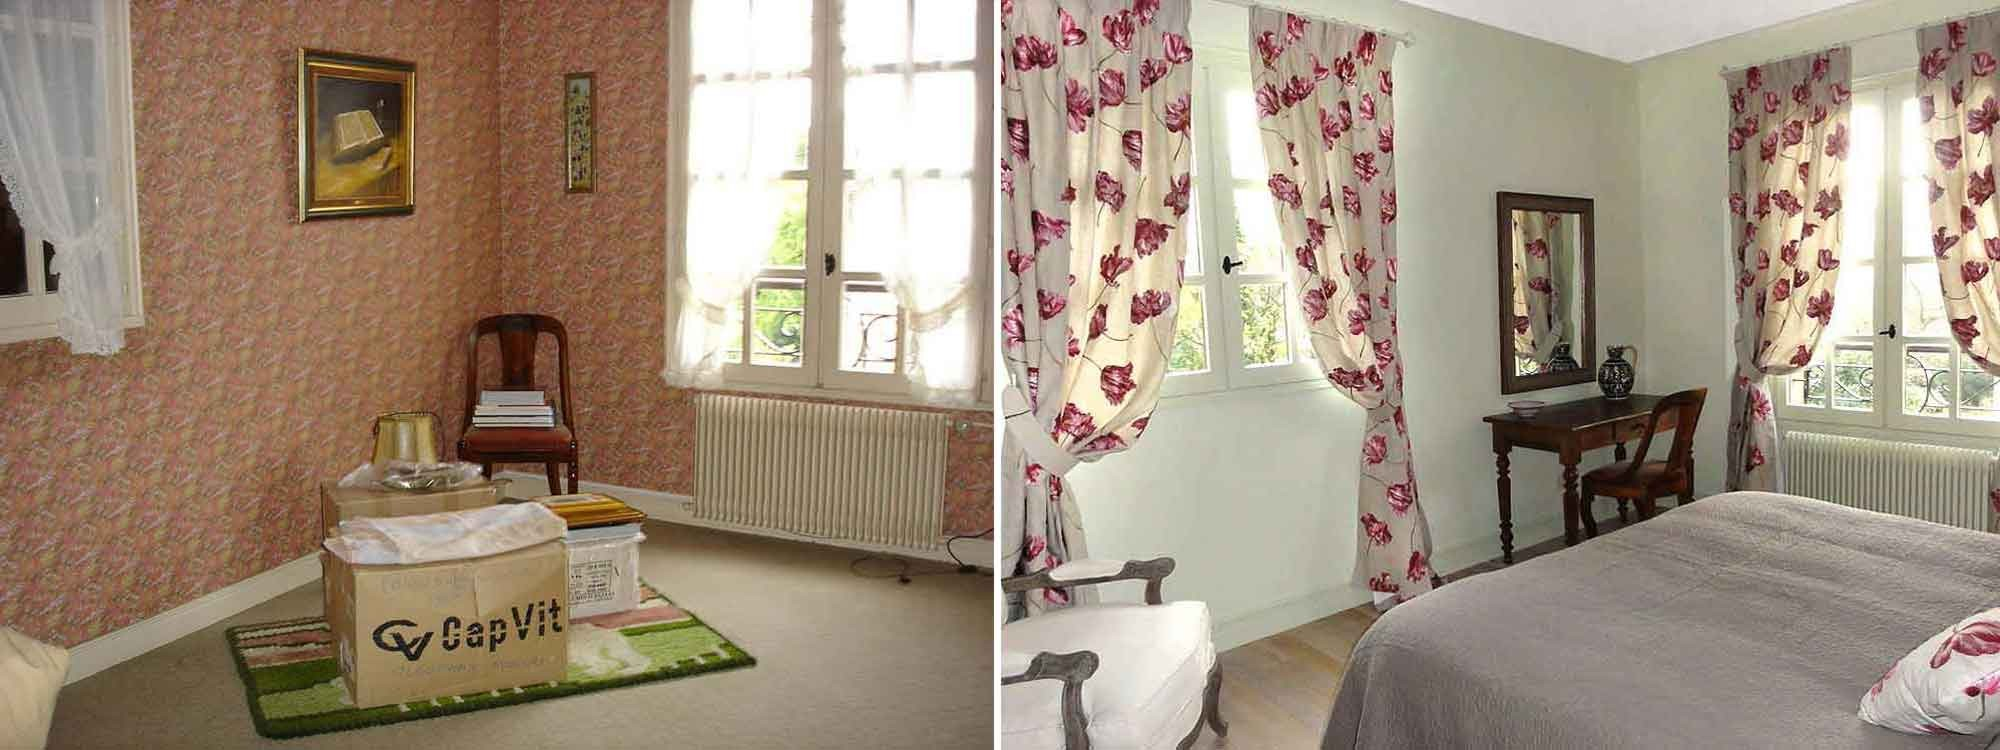 ... Exemples Renovation Chambre A Coucher Avant Apres 6 ...